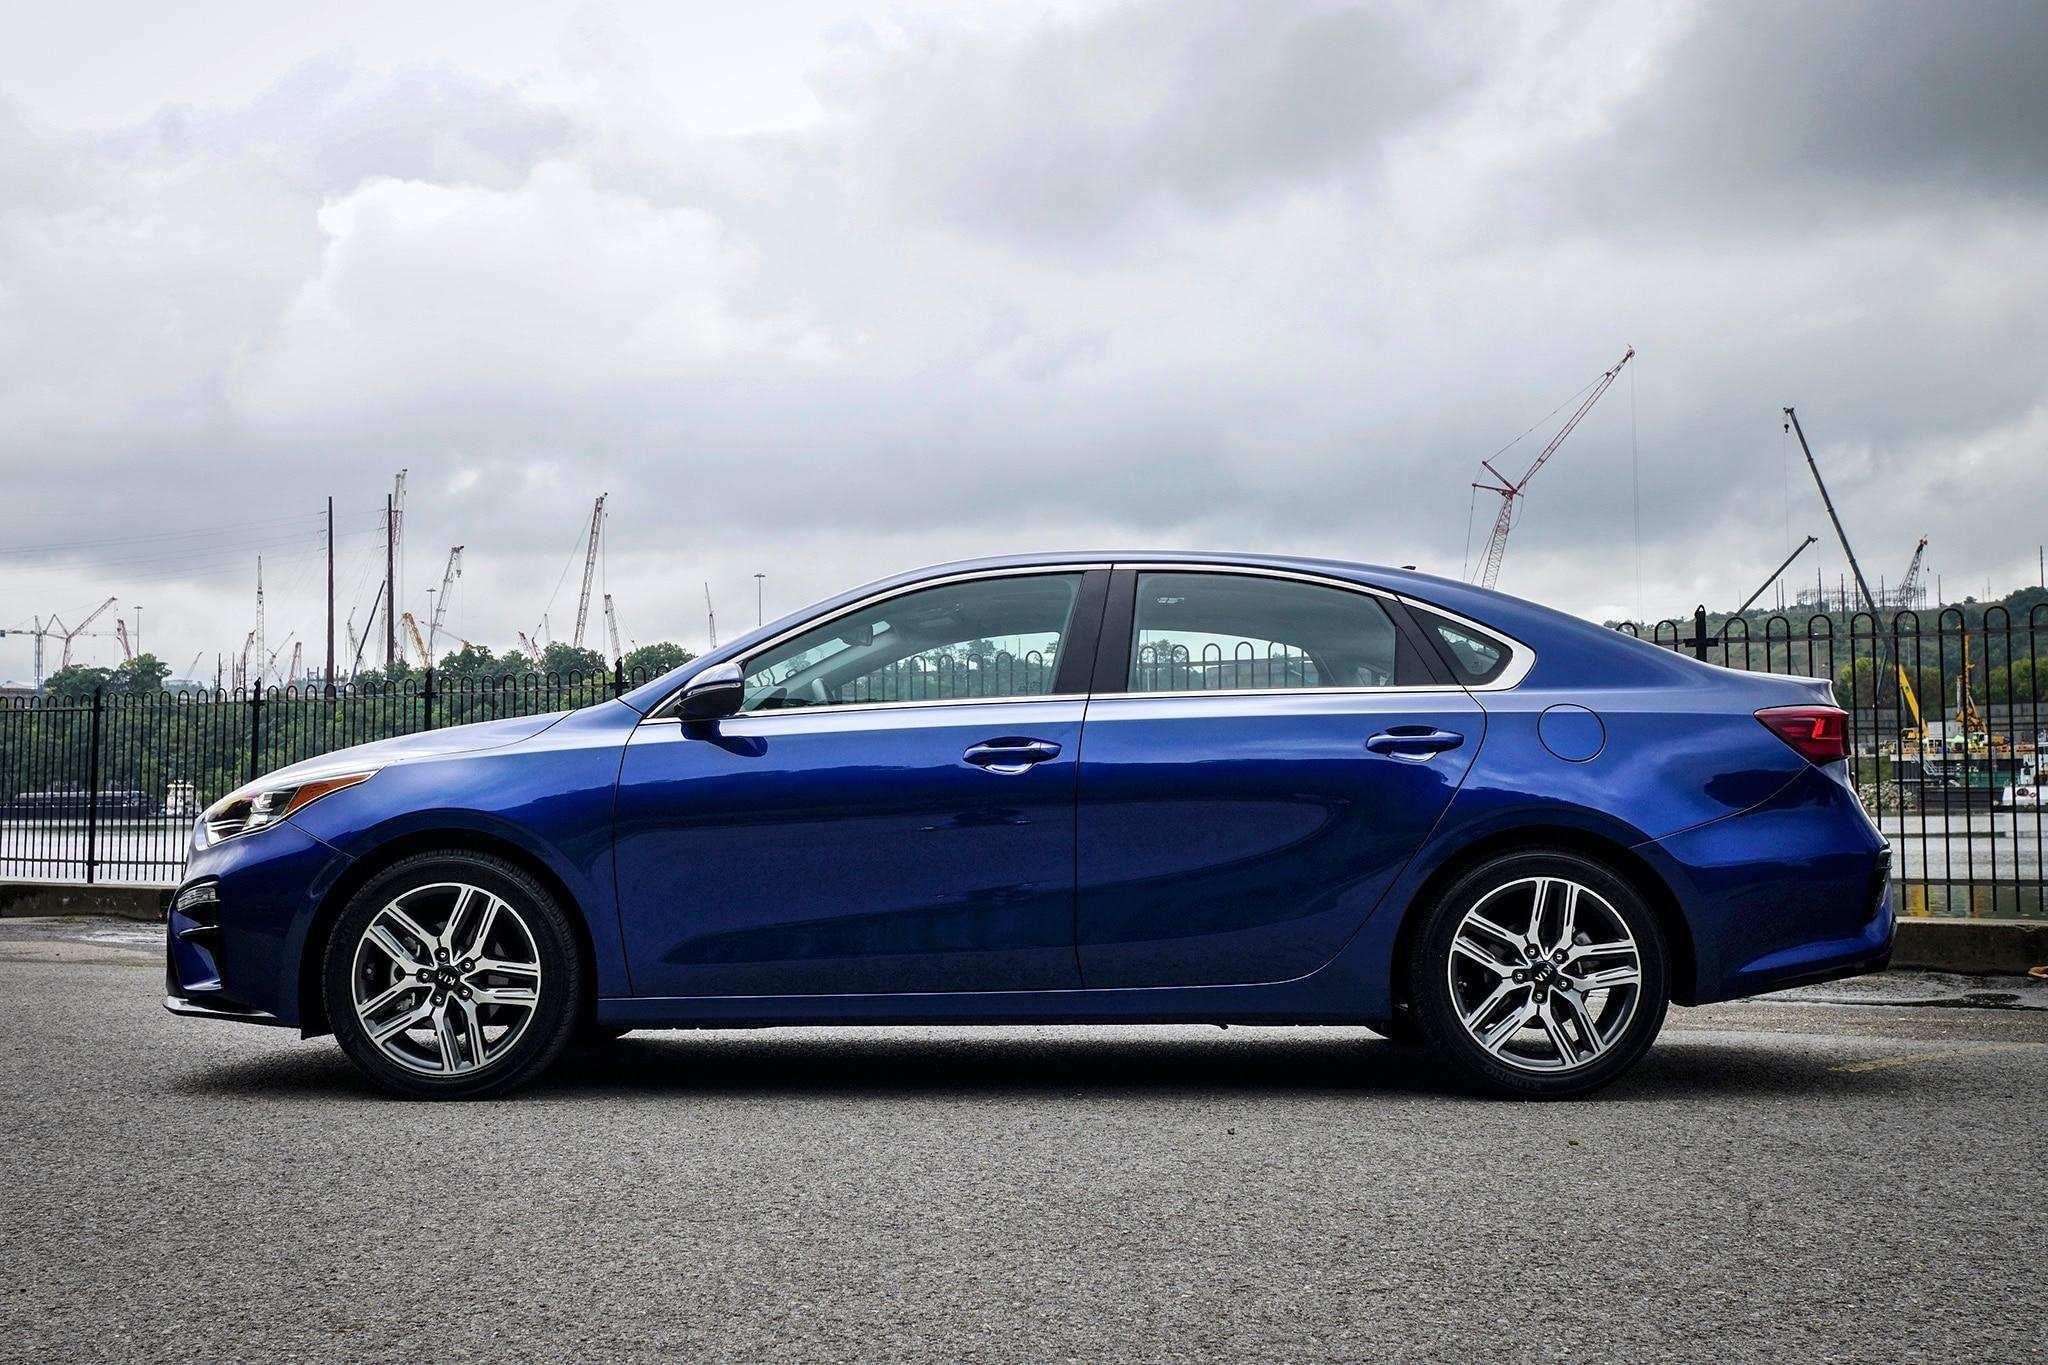 93 New The 2019 Lexus Minivan New Review Spy Shoot for The 2019 Lexus Minivan New Review